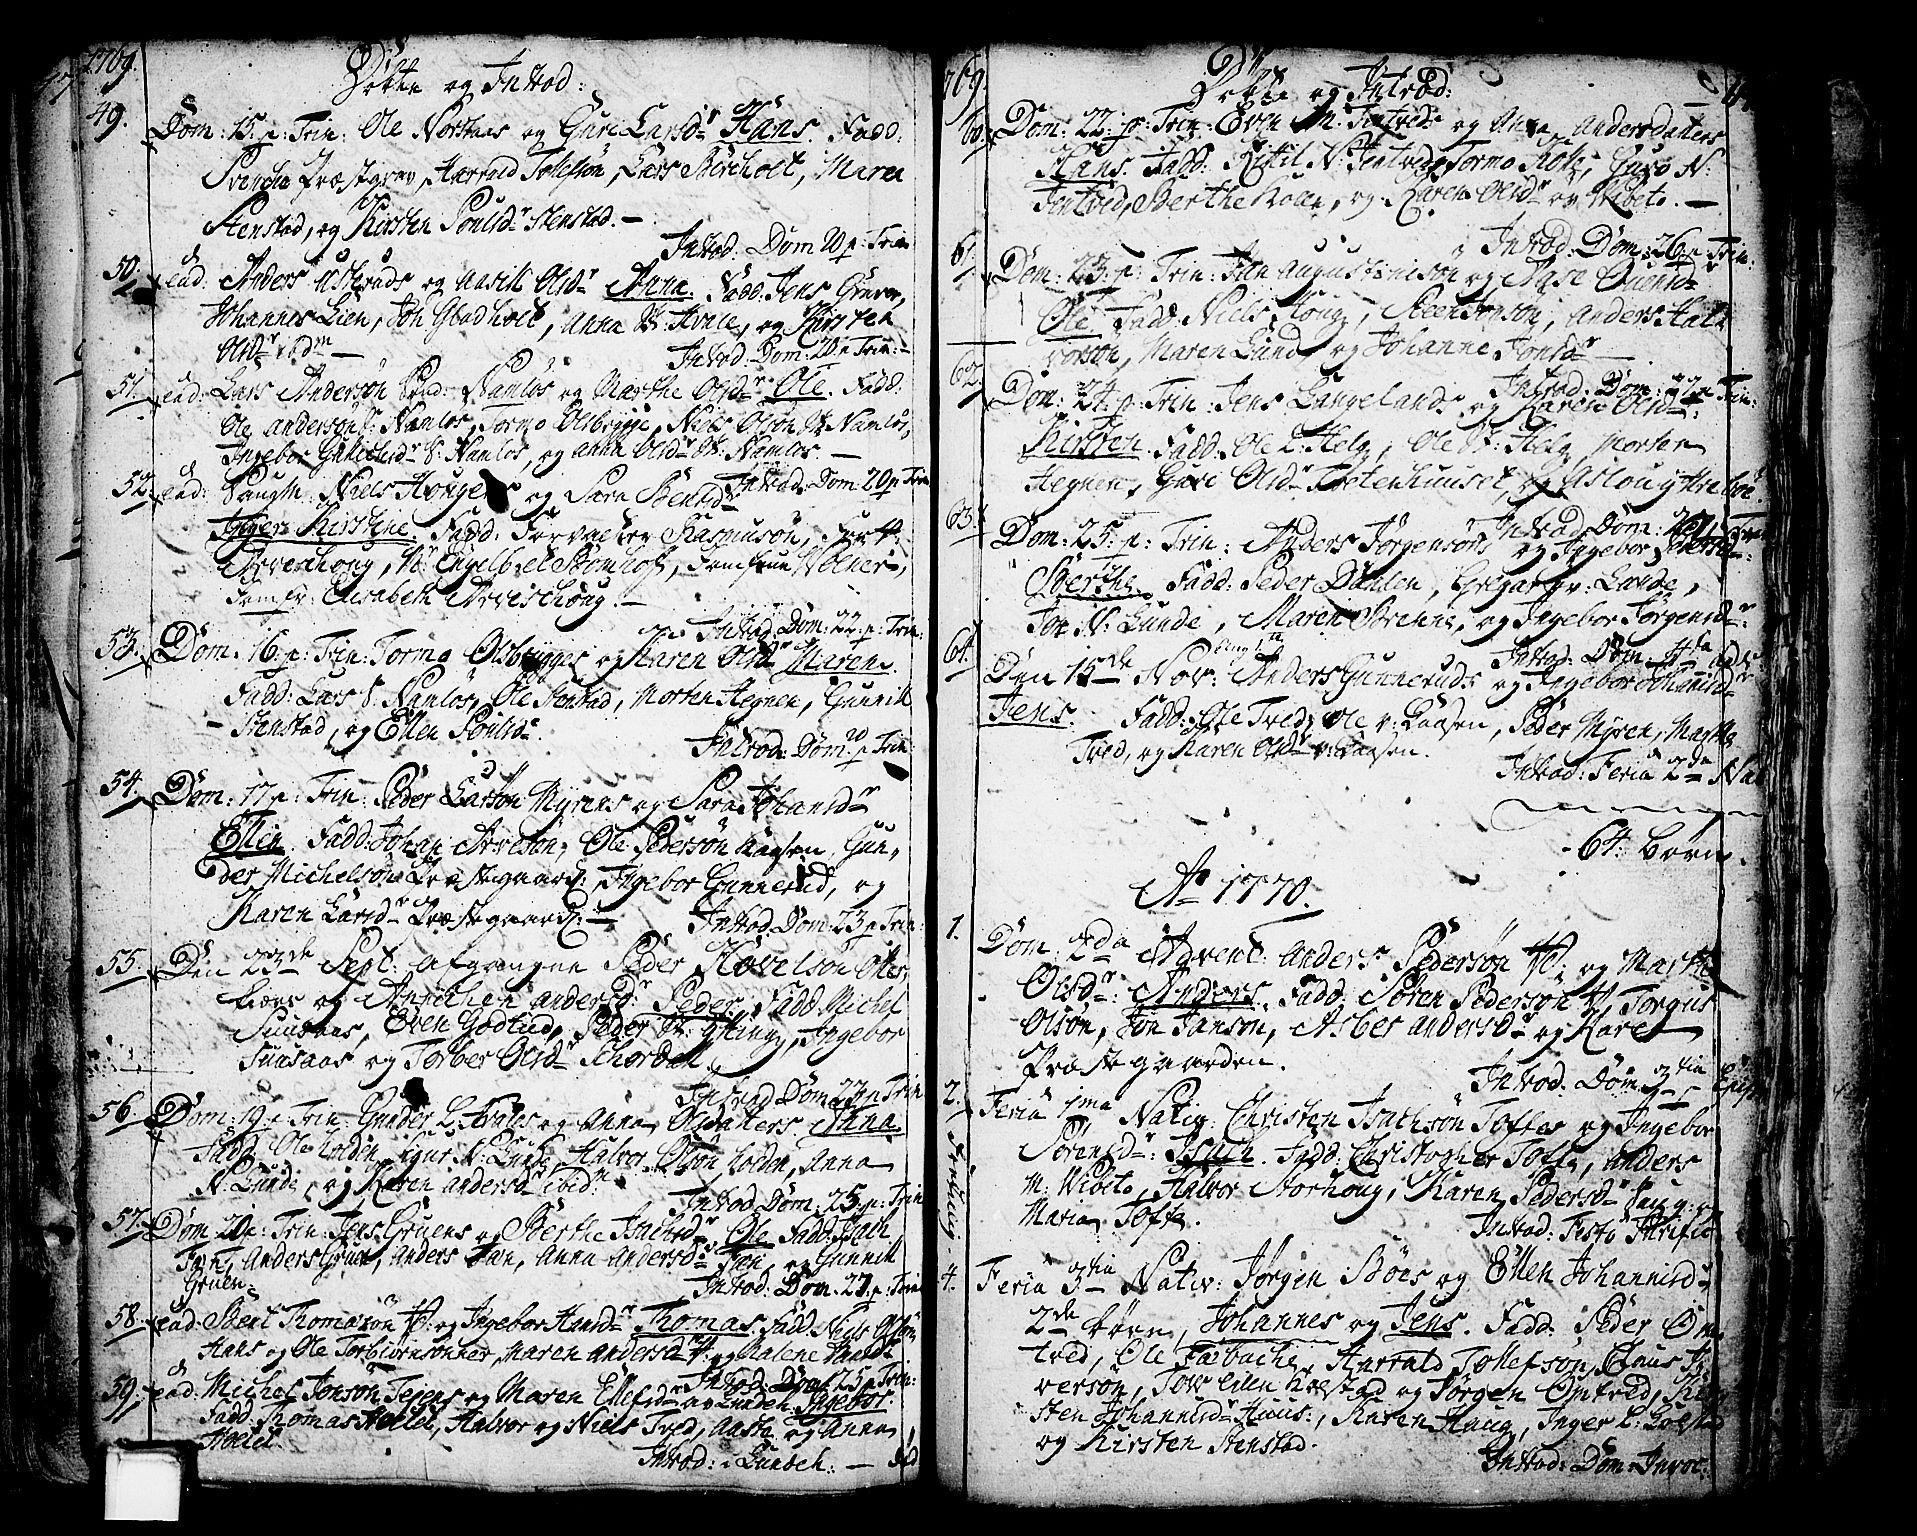 SAKO, Holla kirkebøker, F/Fa/L0001: Ministerialbok nr. 1, 1717-1779, s. 114